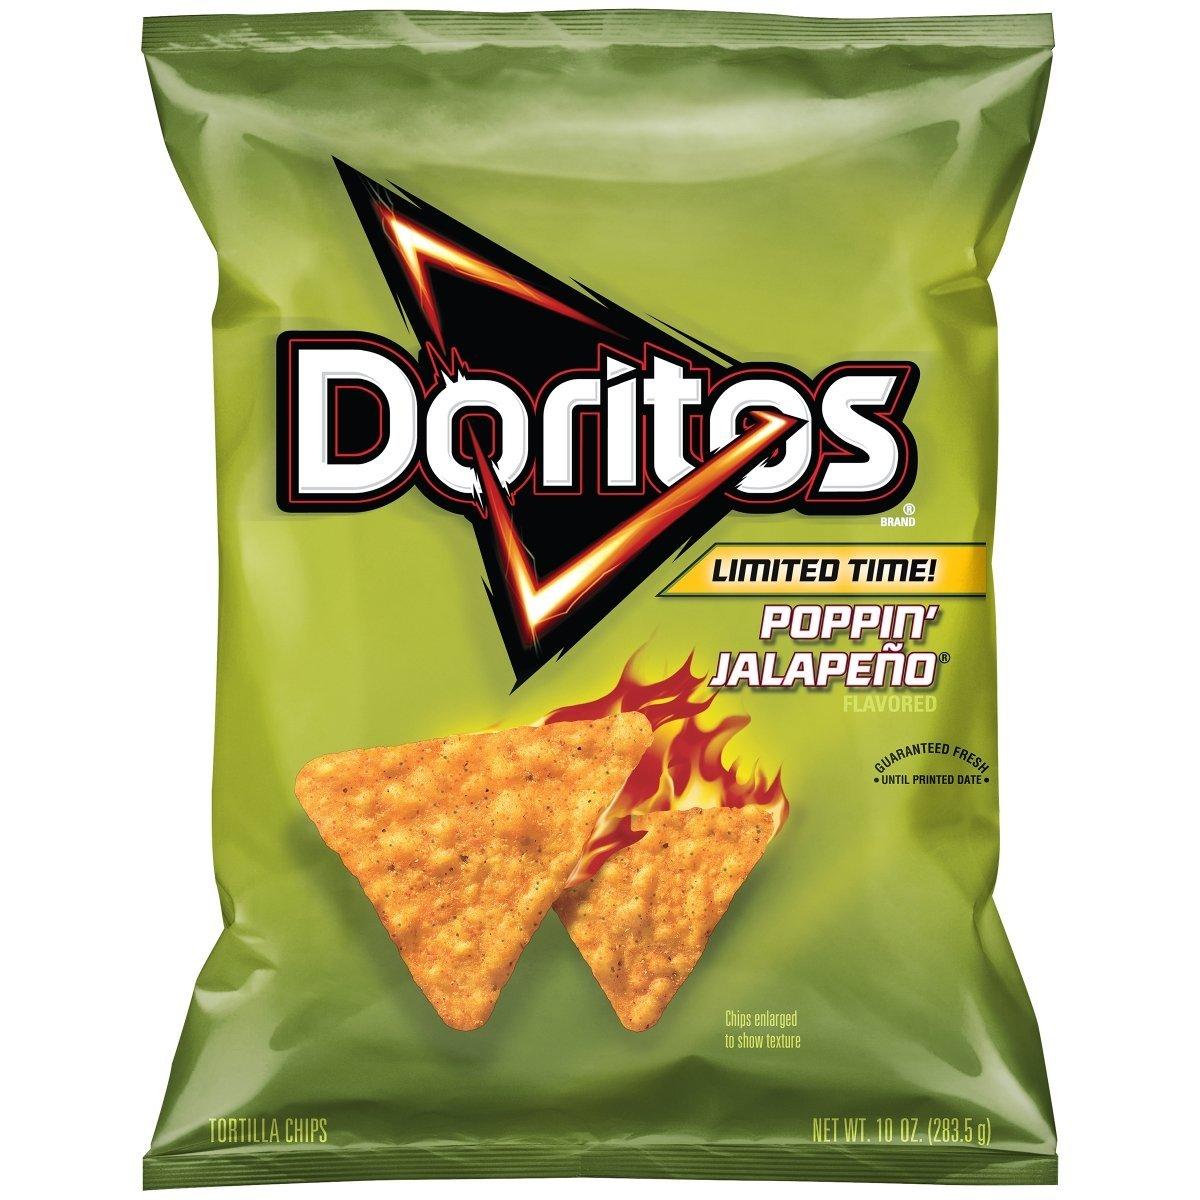 DORITOS® Poppin' Jalapeno Flavored Tortilla Chips